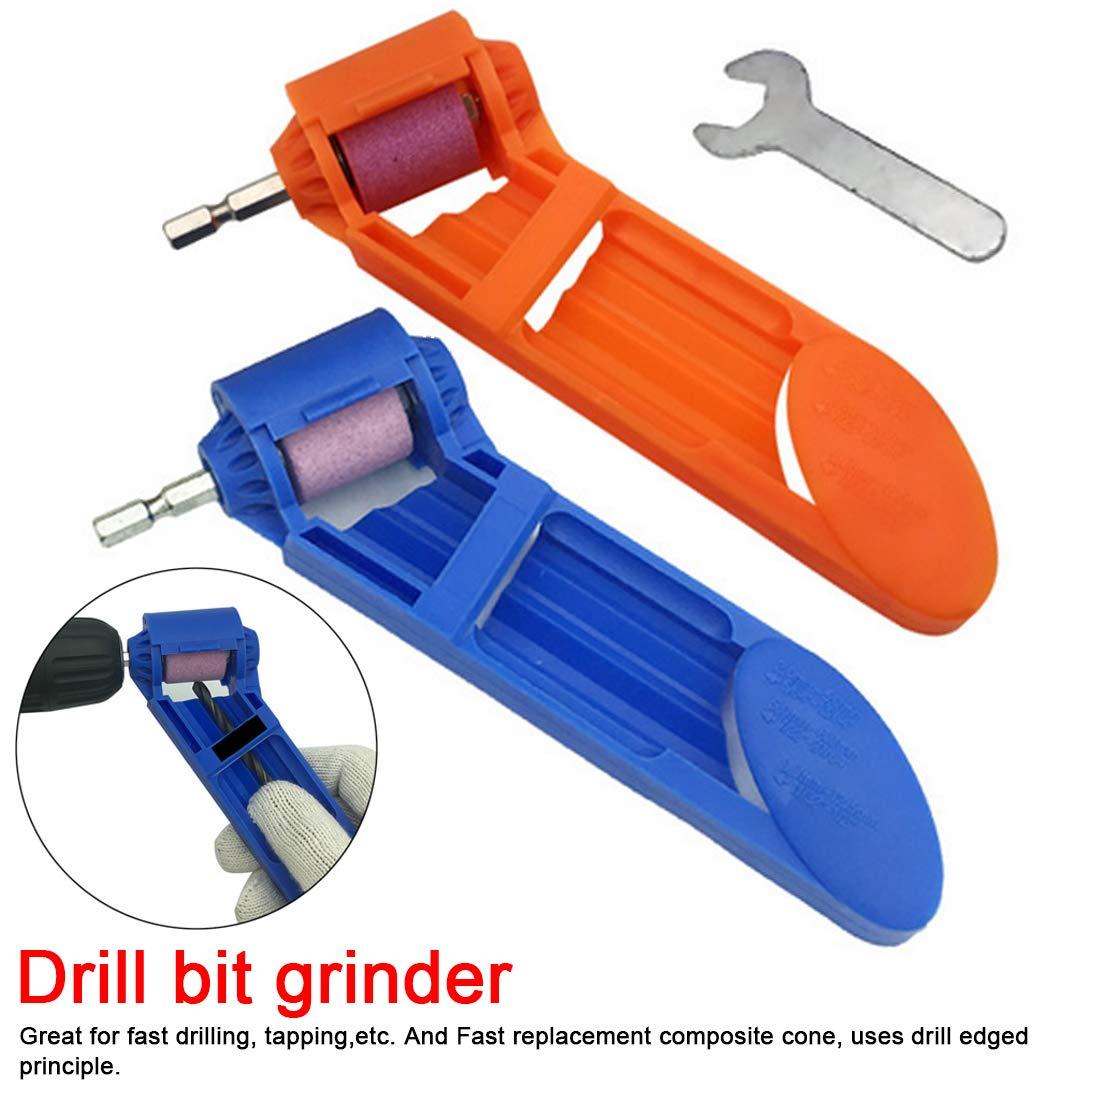 Portable Twist Drill Bit Sharpener Portable Powered Tool for Drill Polishing Wheel Drill Bit Sharpener or Grinder Tools-【砂轮】进口黏结挤